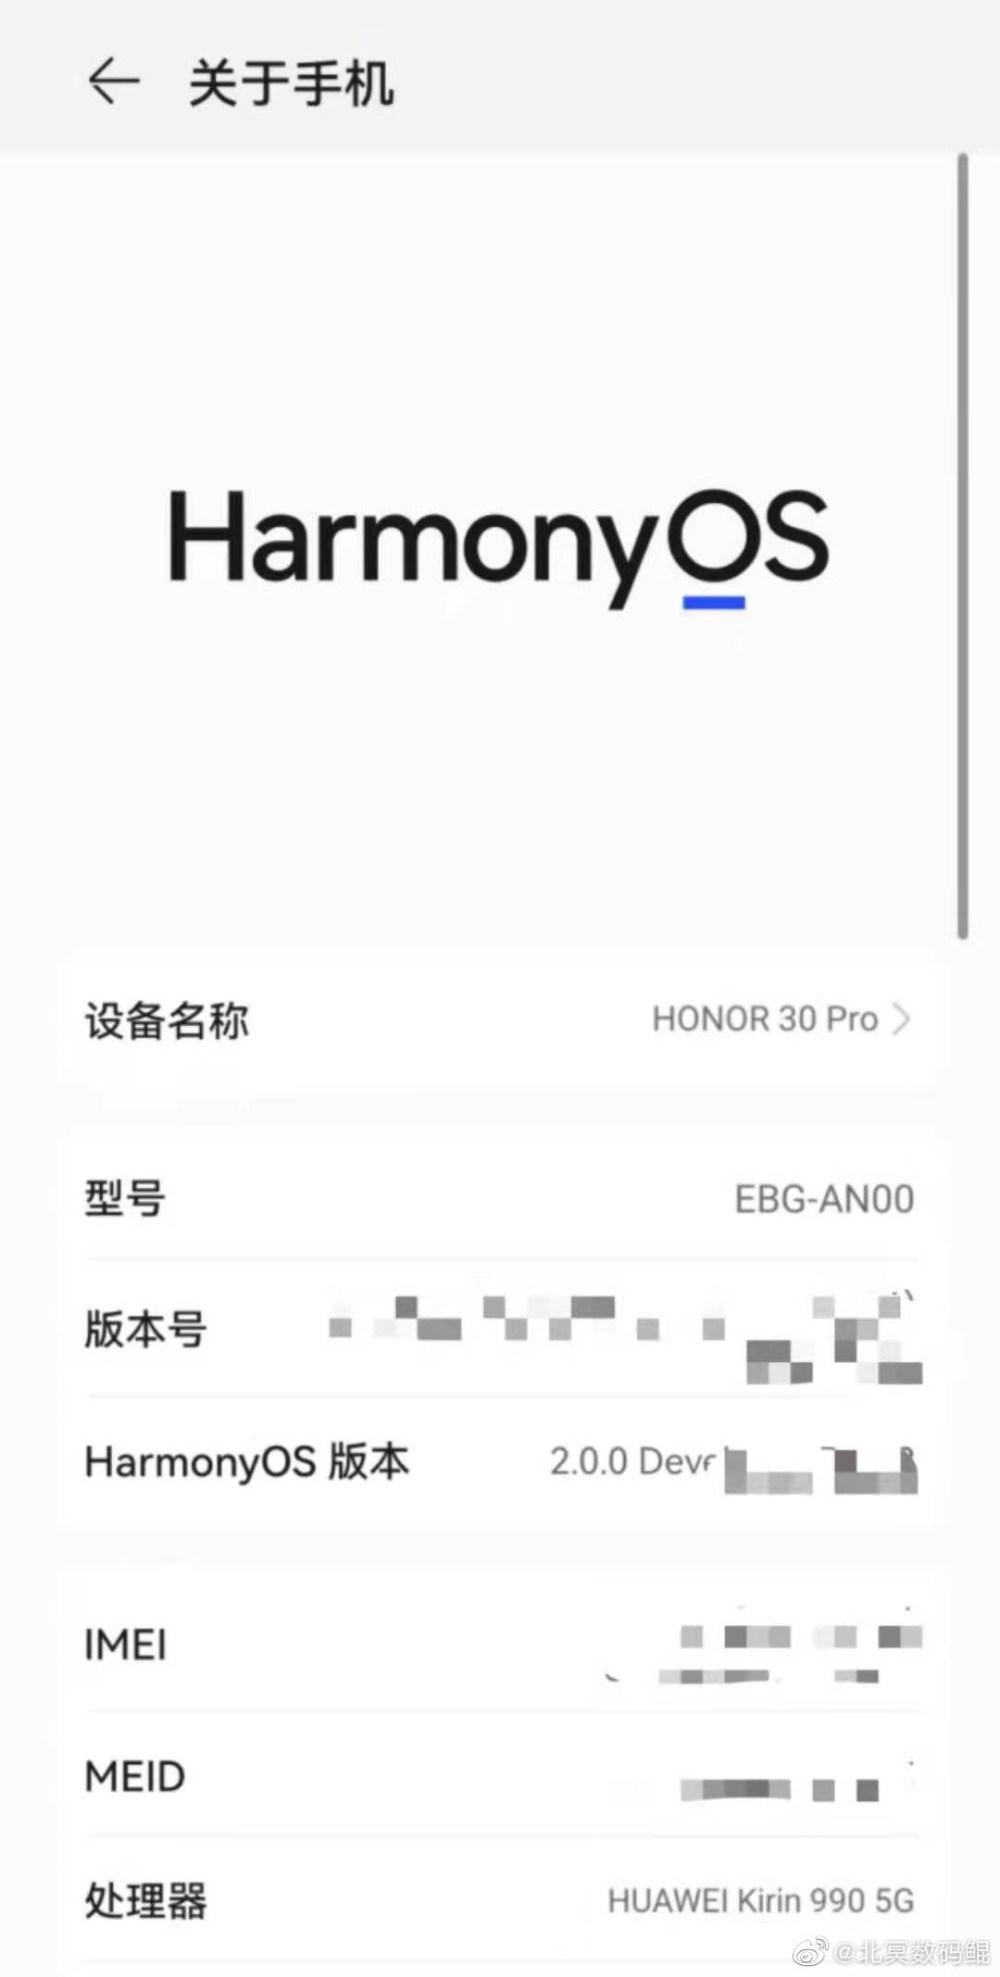 Honor 30 Pro HarmonyOS 2.0 beta testing